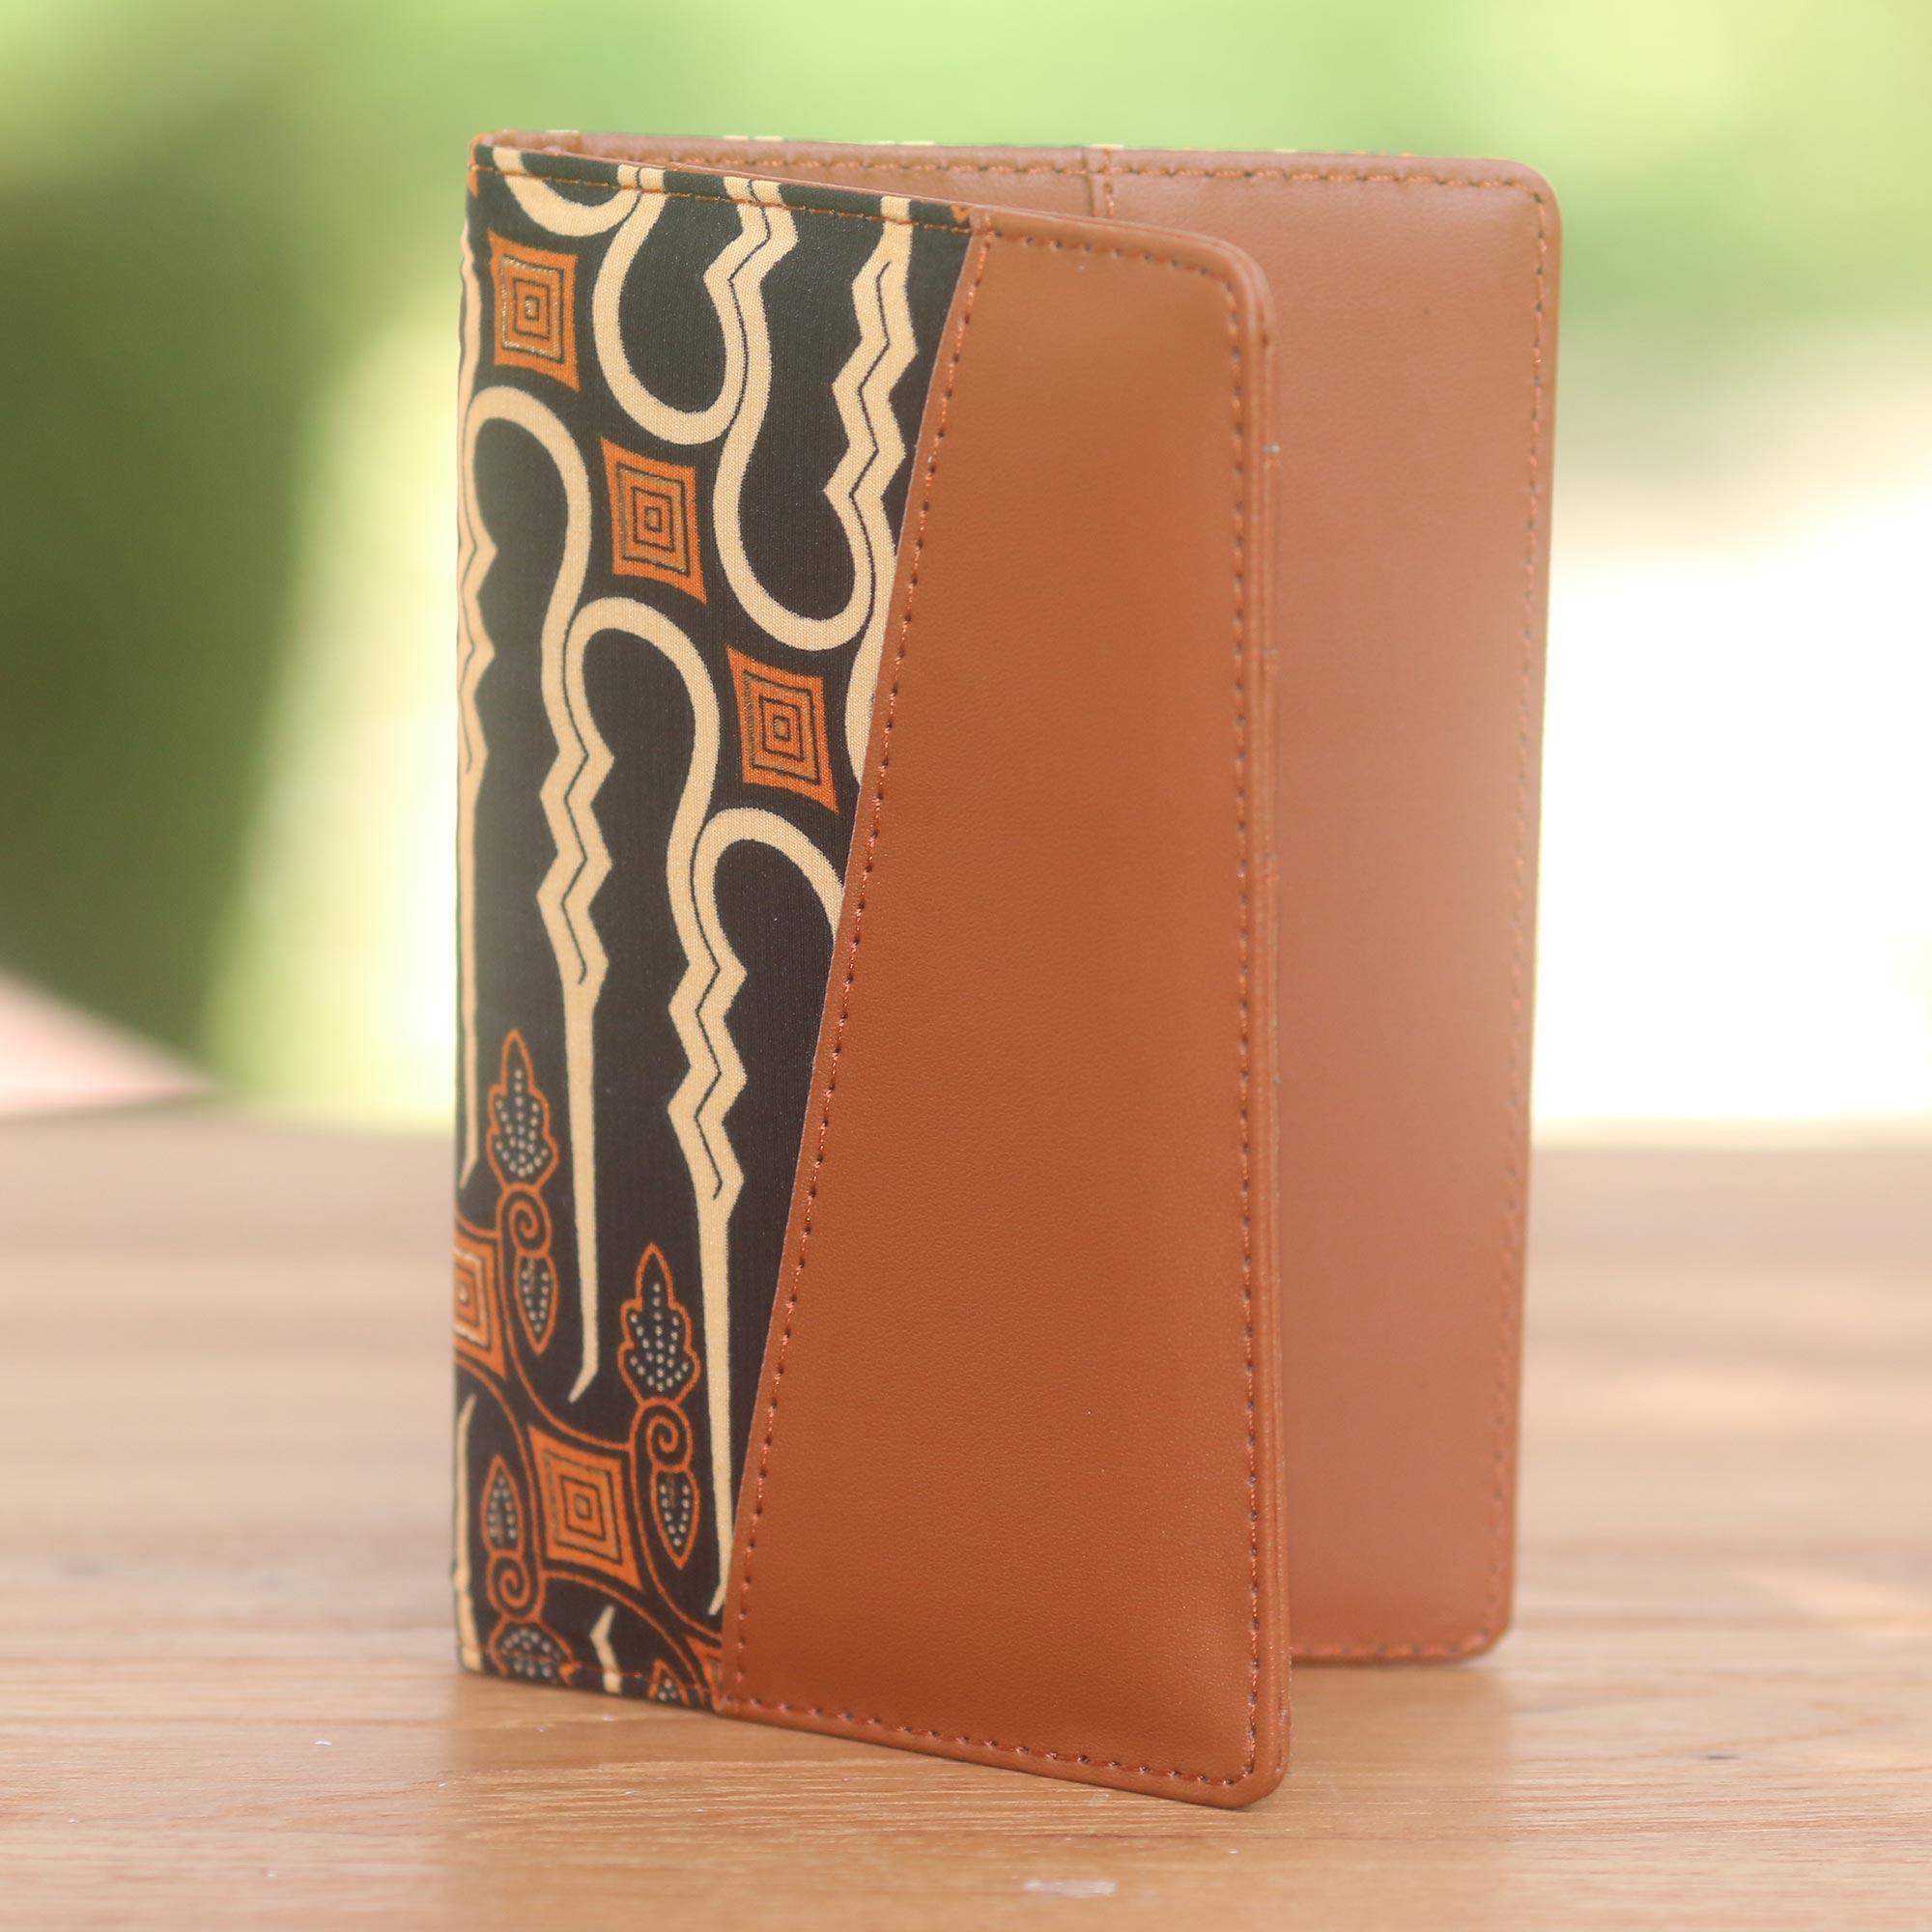 Especially Beautiful Bone Multi-purpose Travel Passport Set With Storage Bag Leather Passport Holder Passport Holder With Passport Holder Travel Wallet